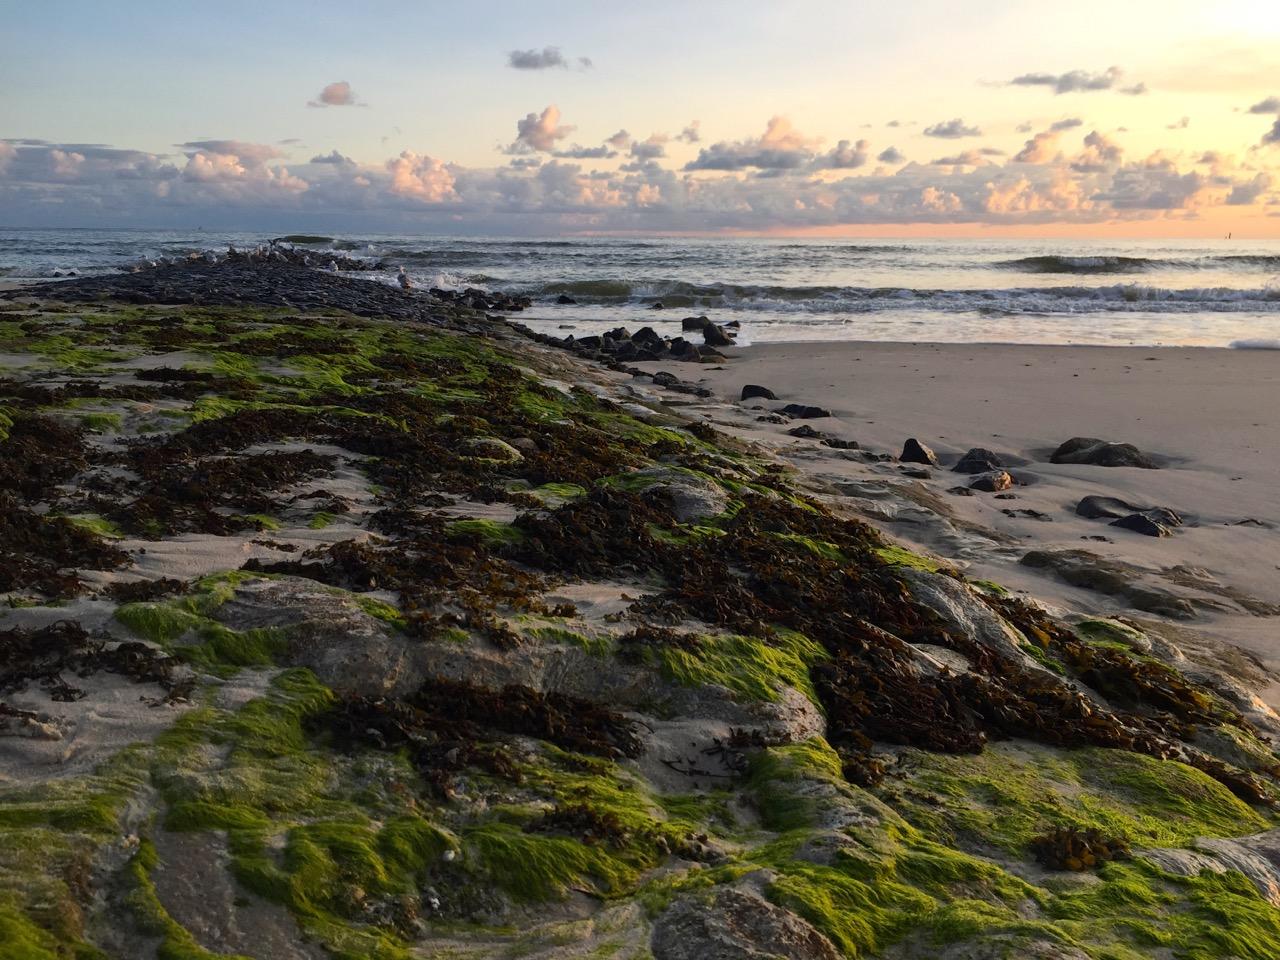 Wangerooge Urlaub – Natur, Wellness, Aktiv